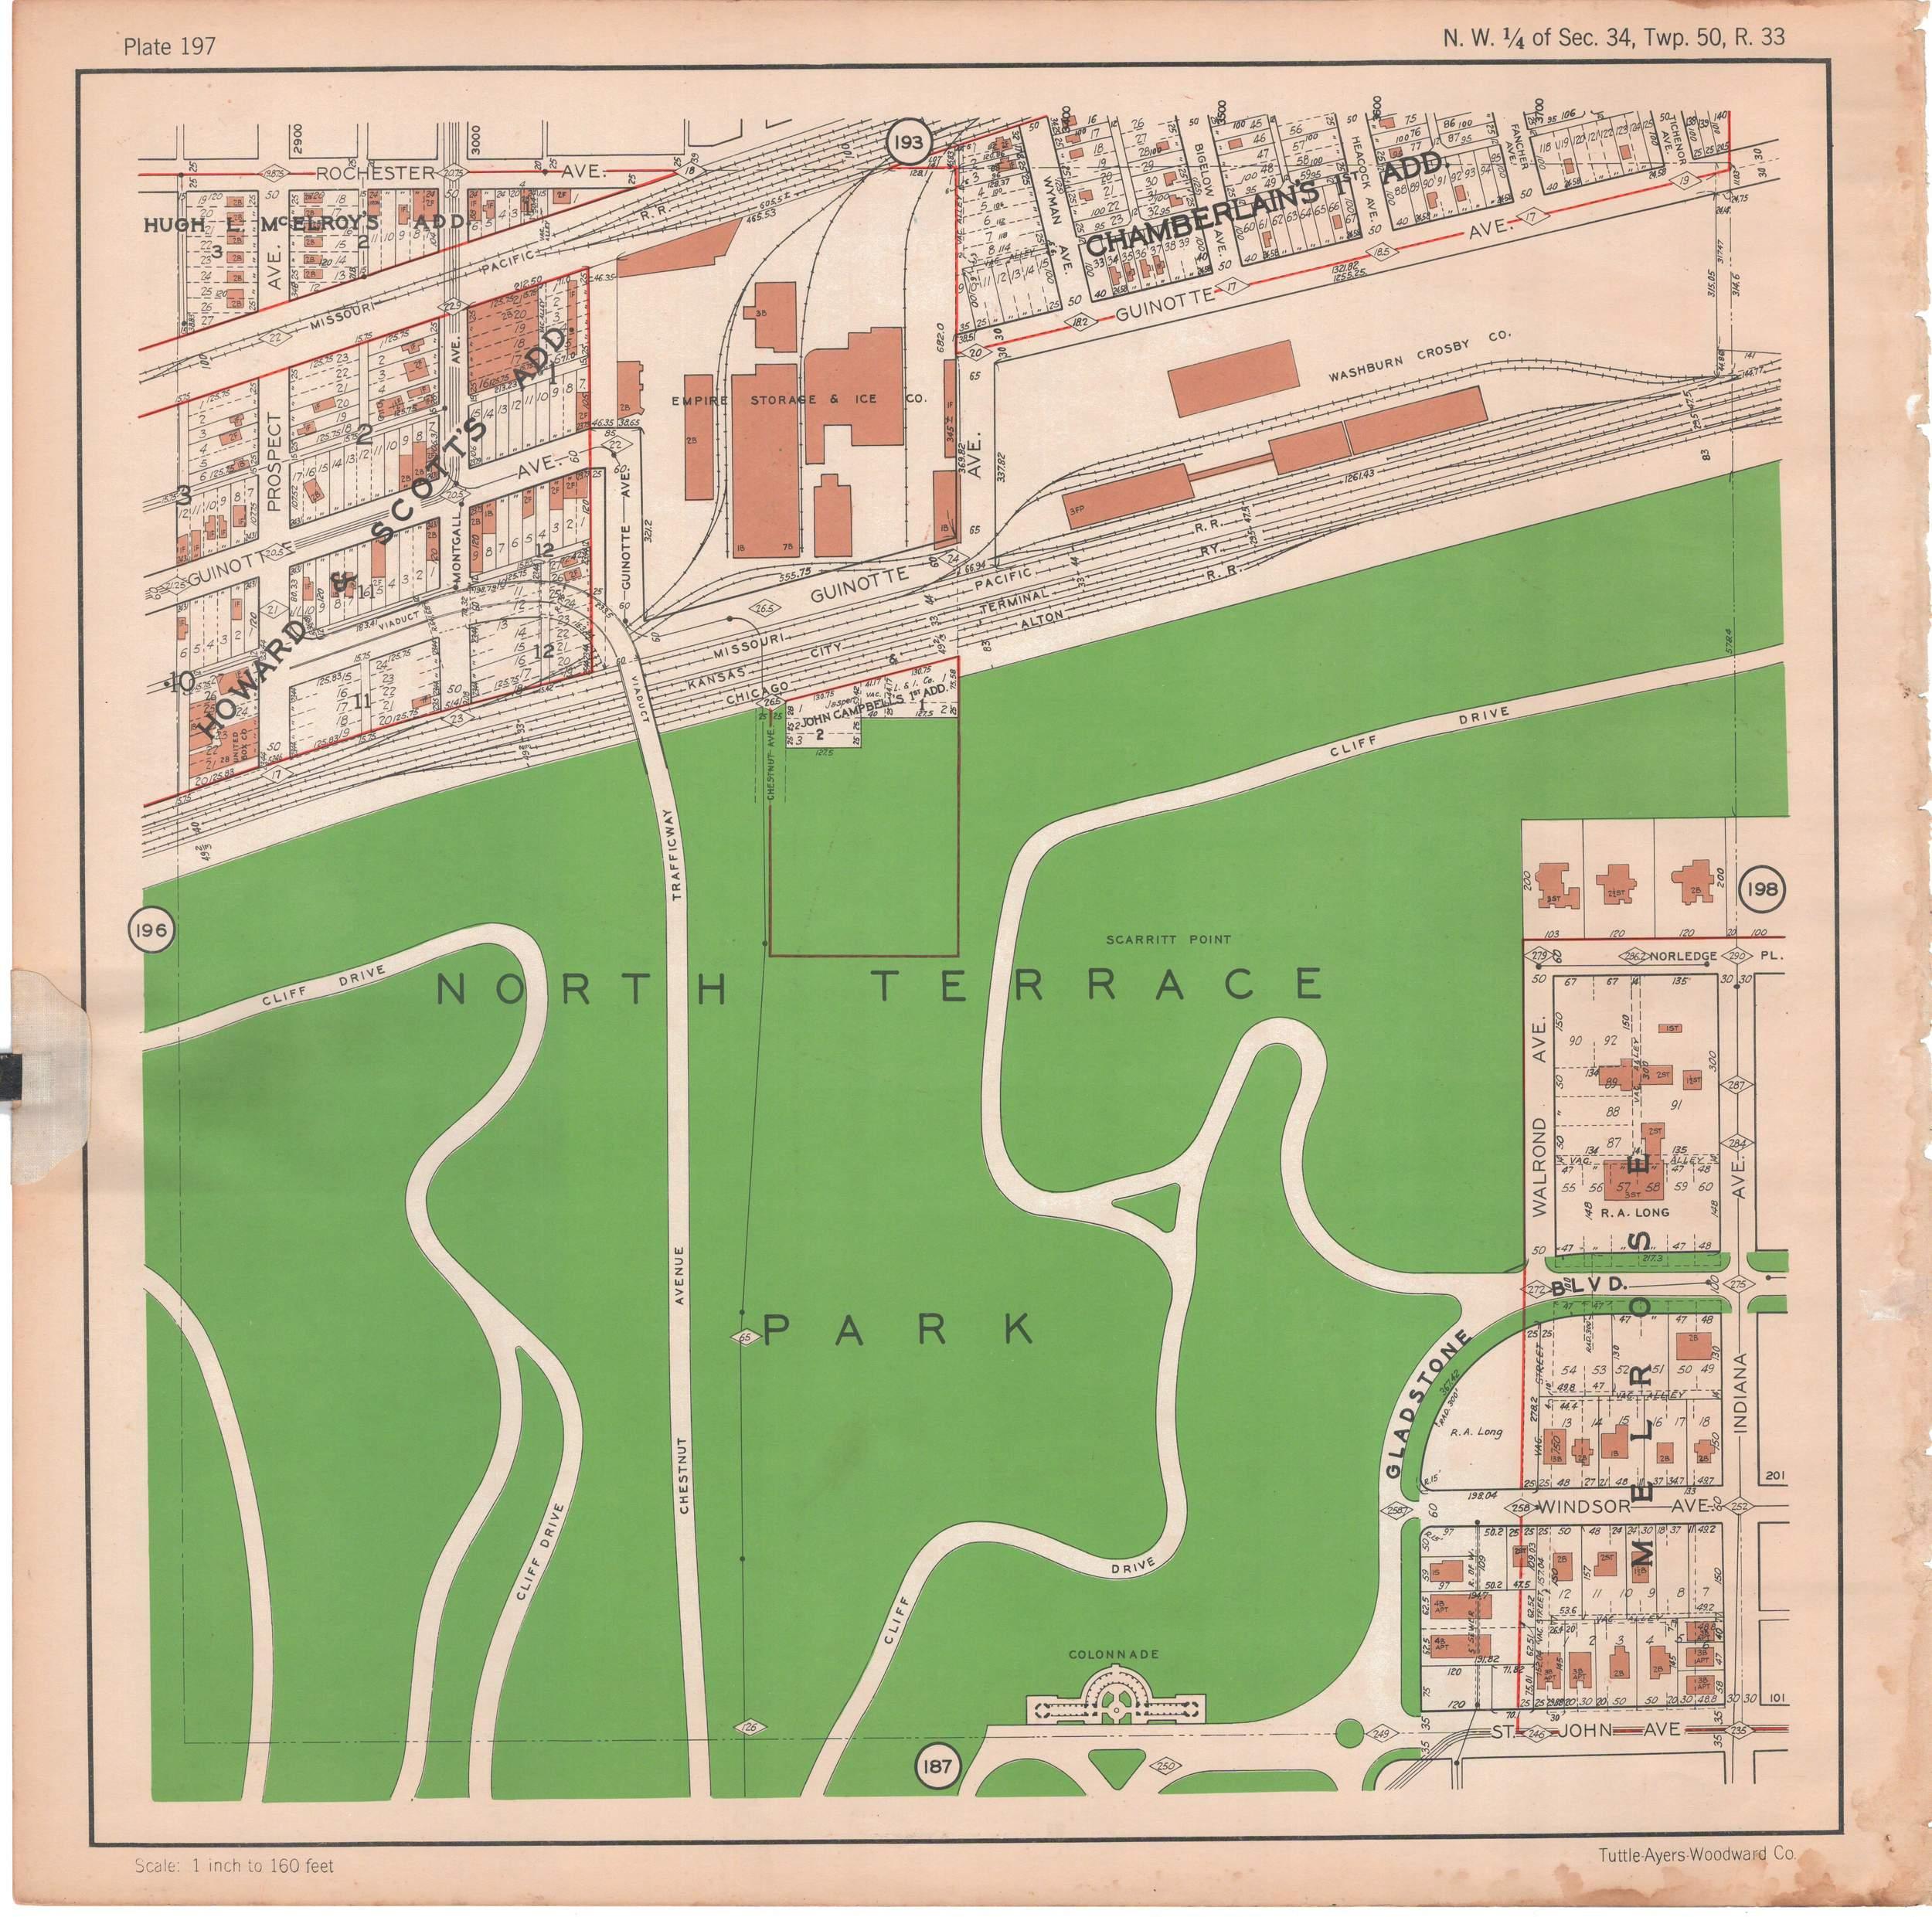 1925 TUTTLE_AYERS_Plate_197.JPG